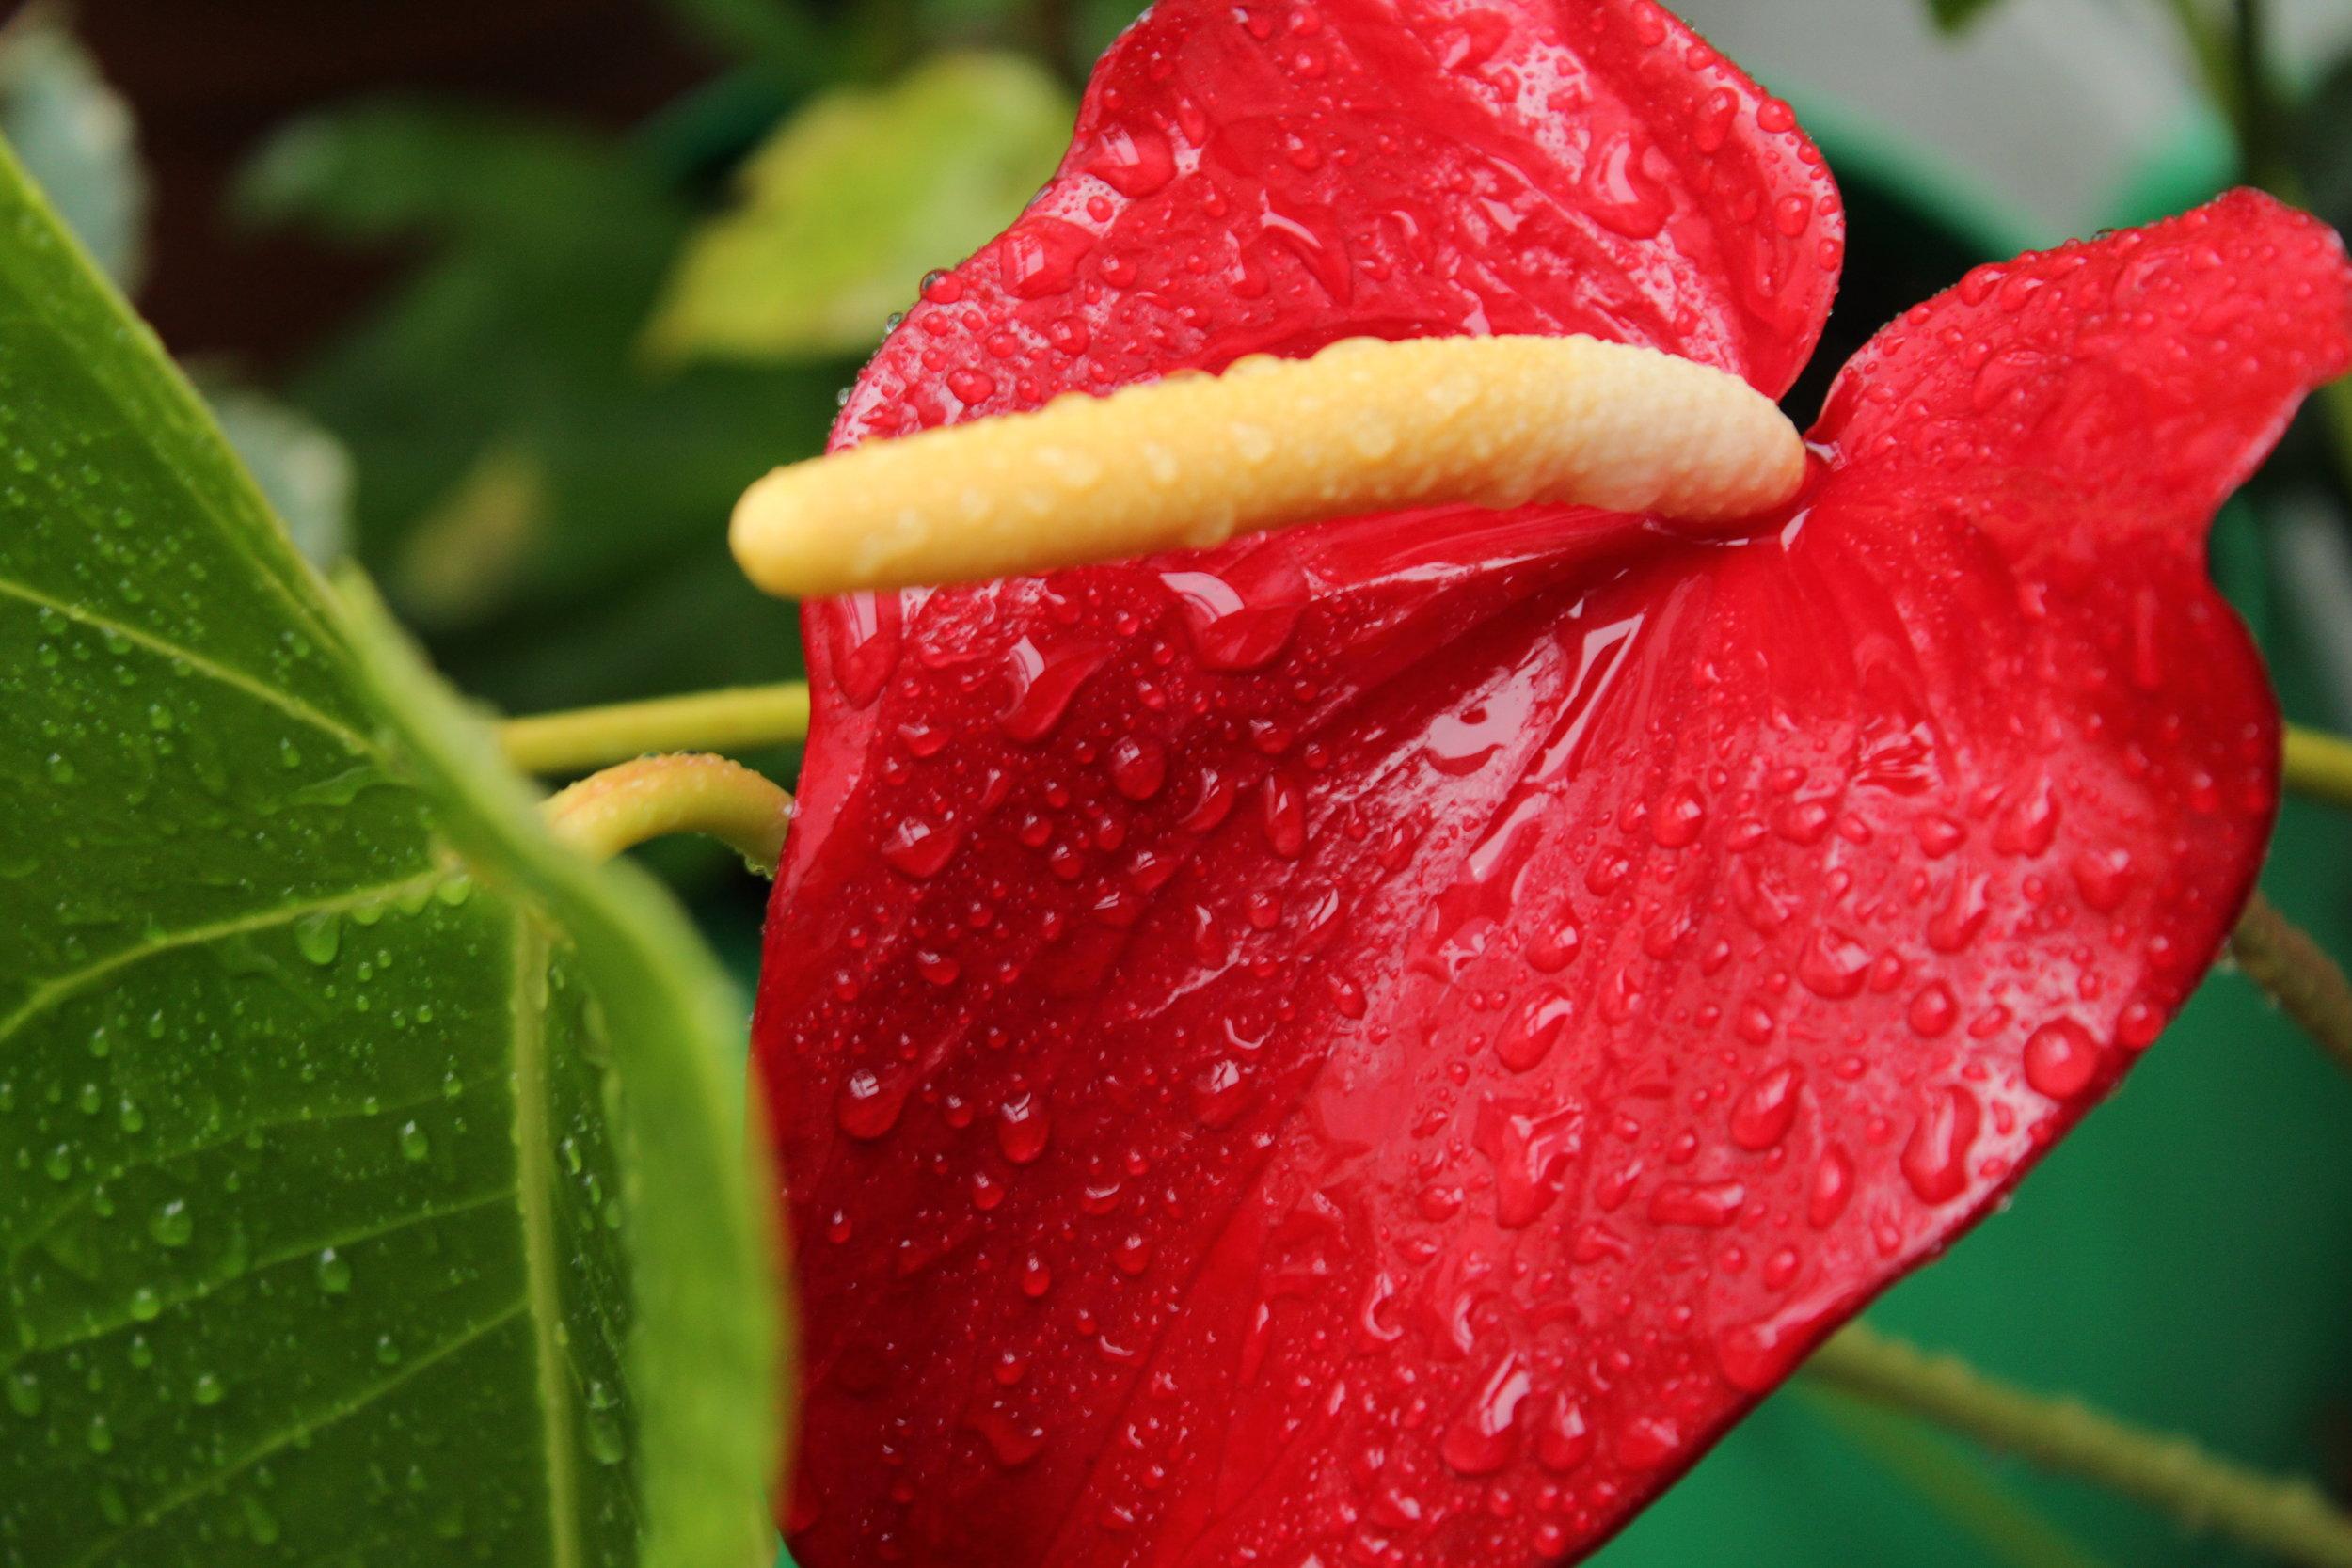 nature-flower-rain-red-anthurium-leaf-1574473-pxhere.com.jpg